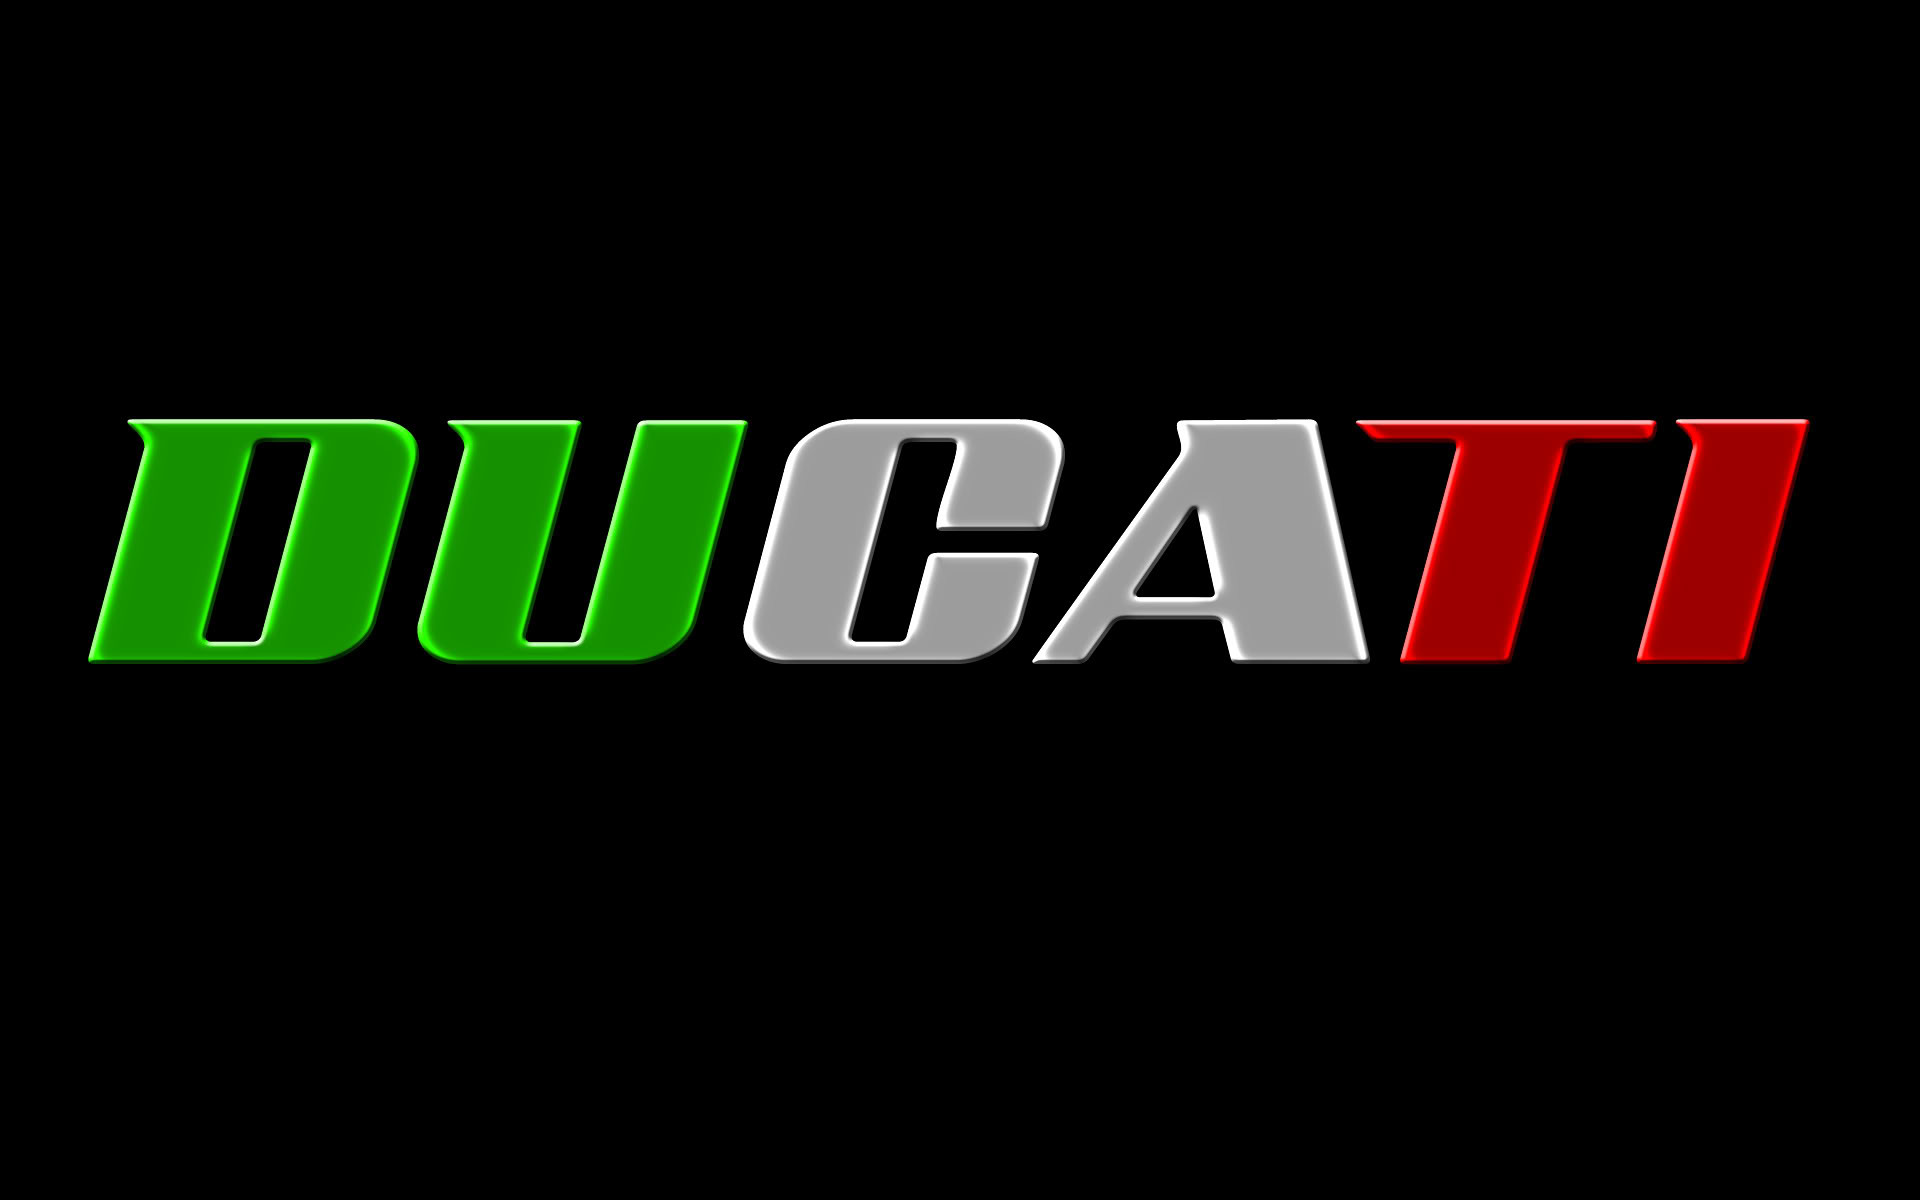 Ducati Motorcycle Logos